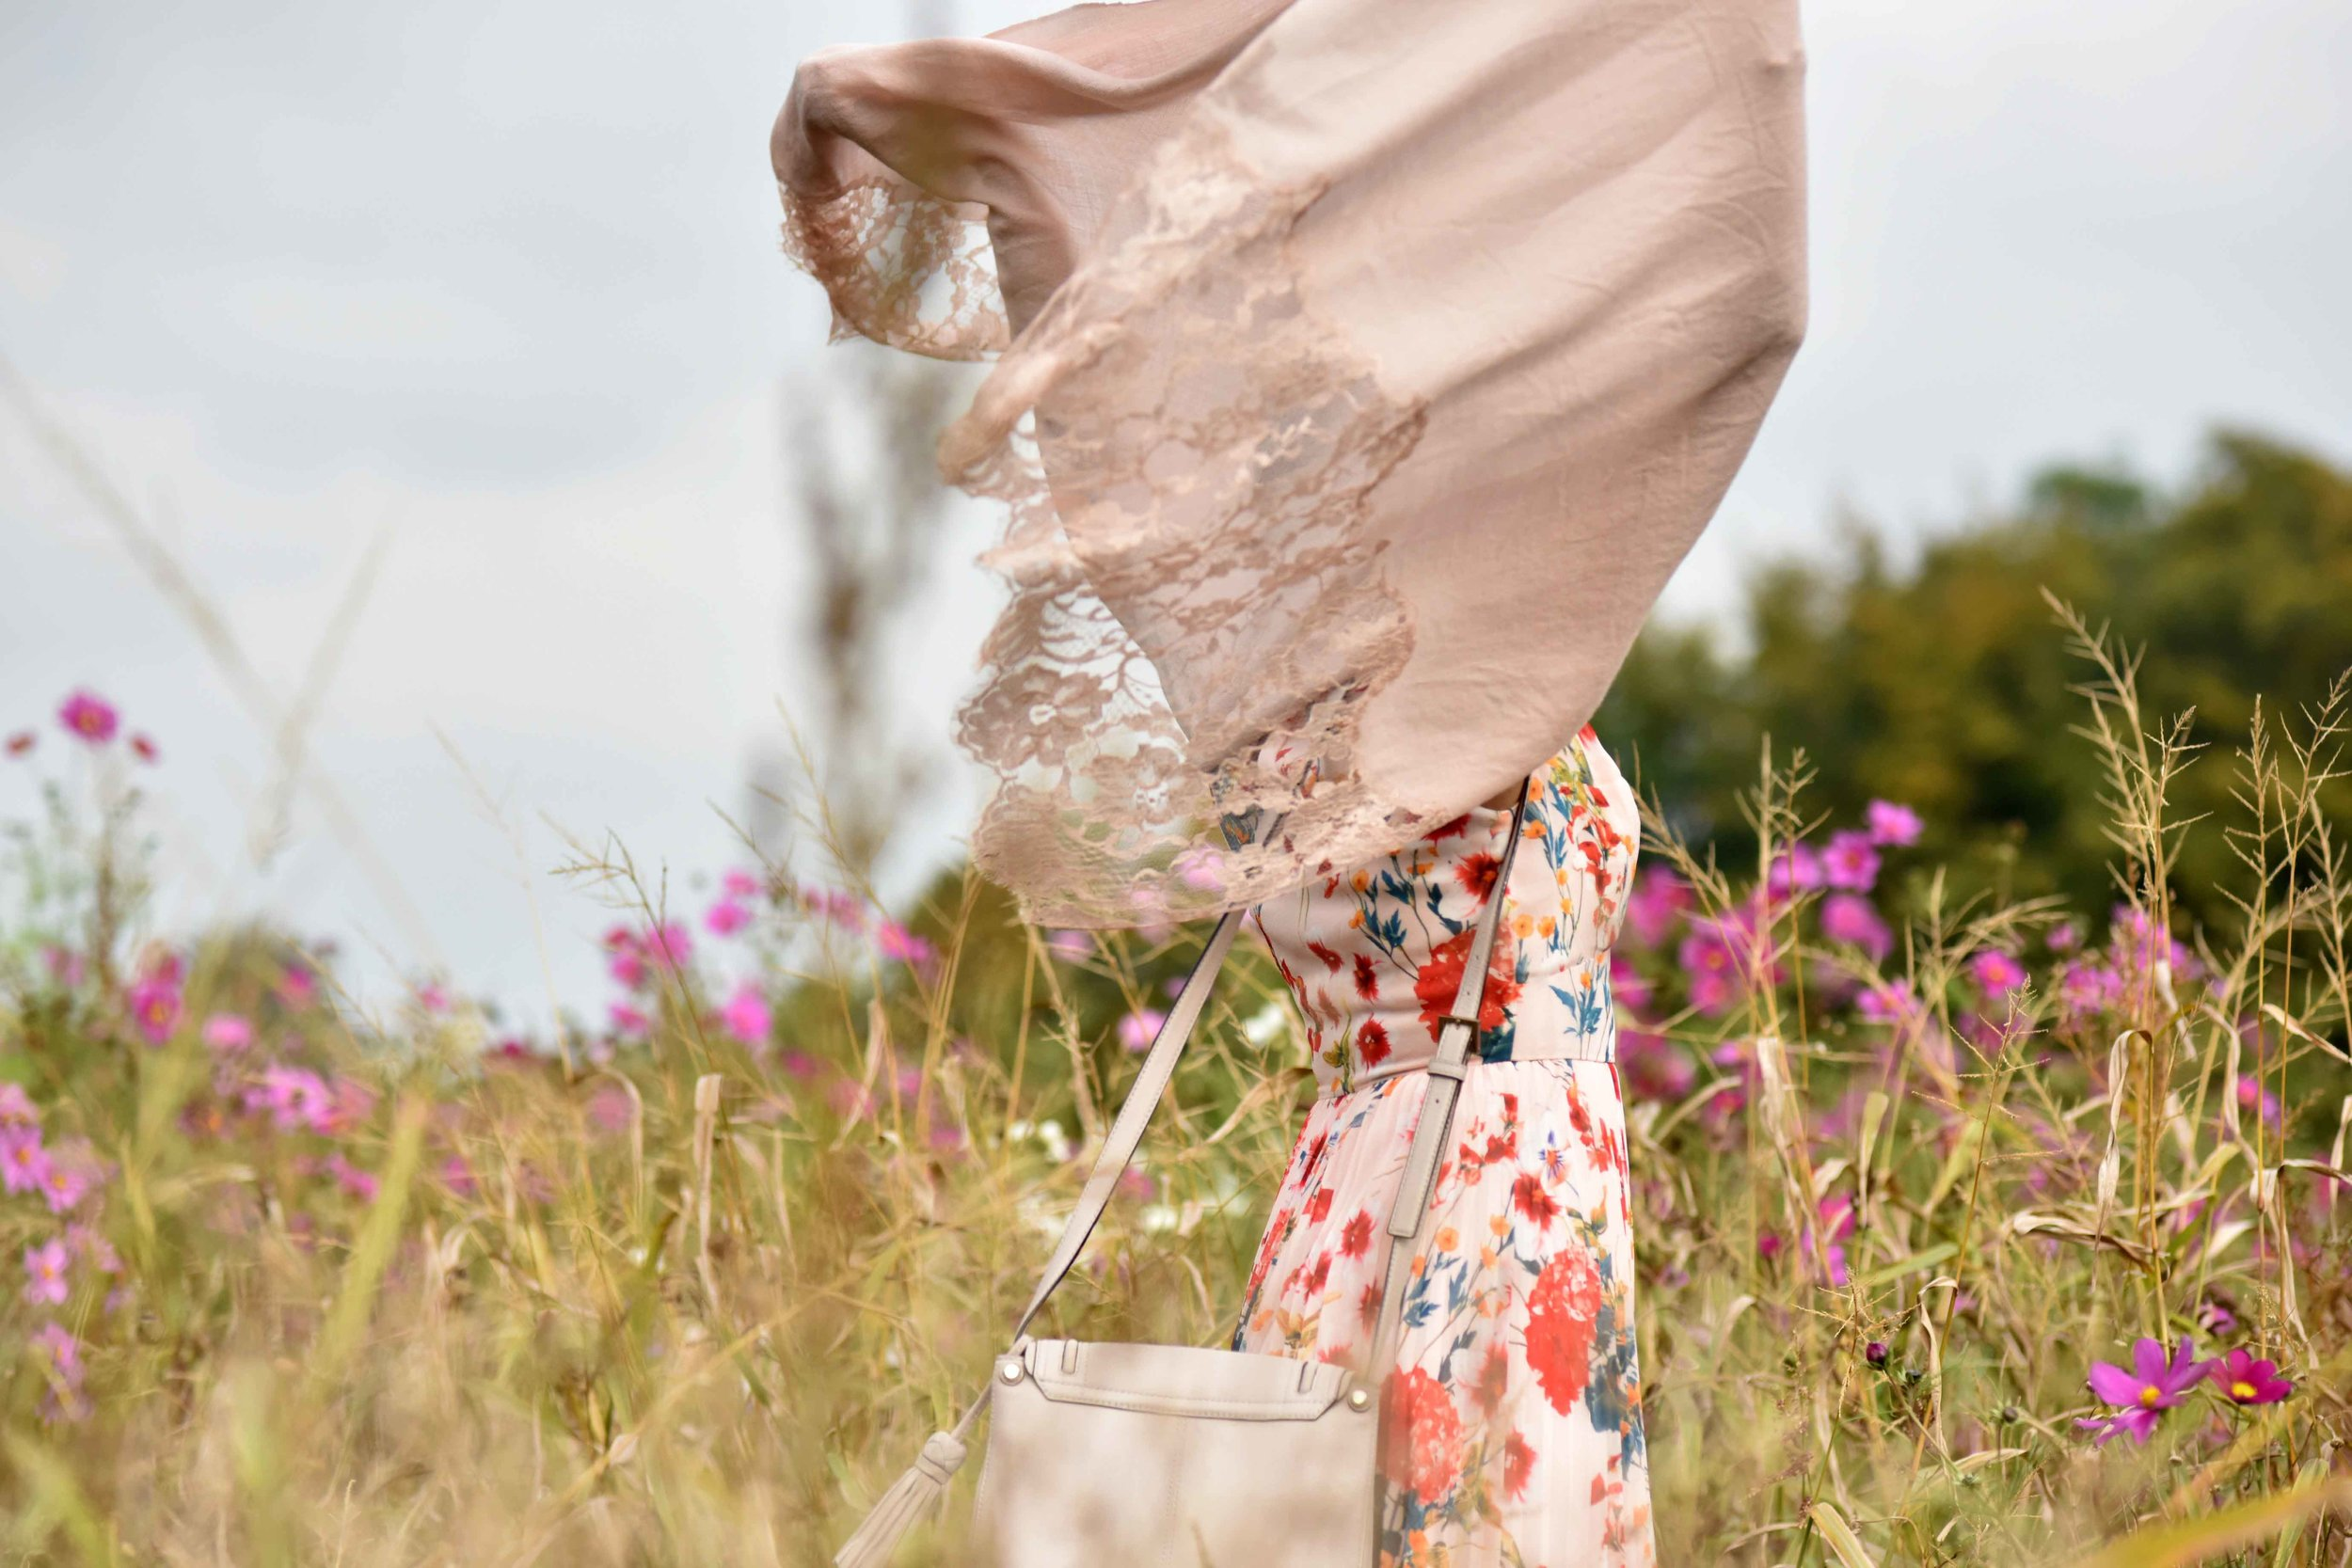 Karen Millen floral summer dress, Kate Spade bag, cashmere wrap, flower fields, Coworth Park hotel, Ascot. Image©sourcingstyle.com